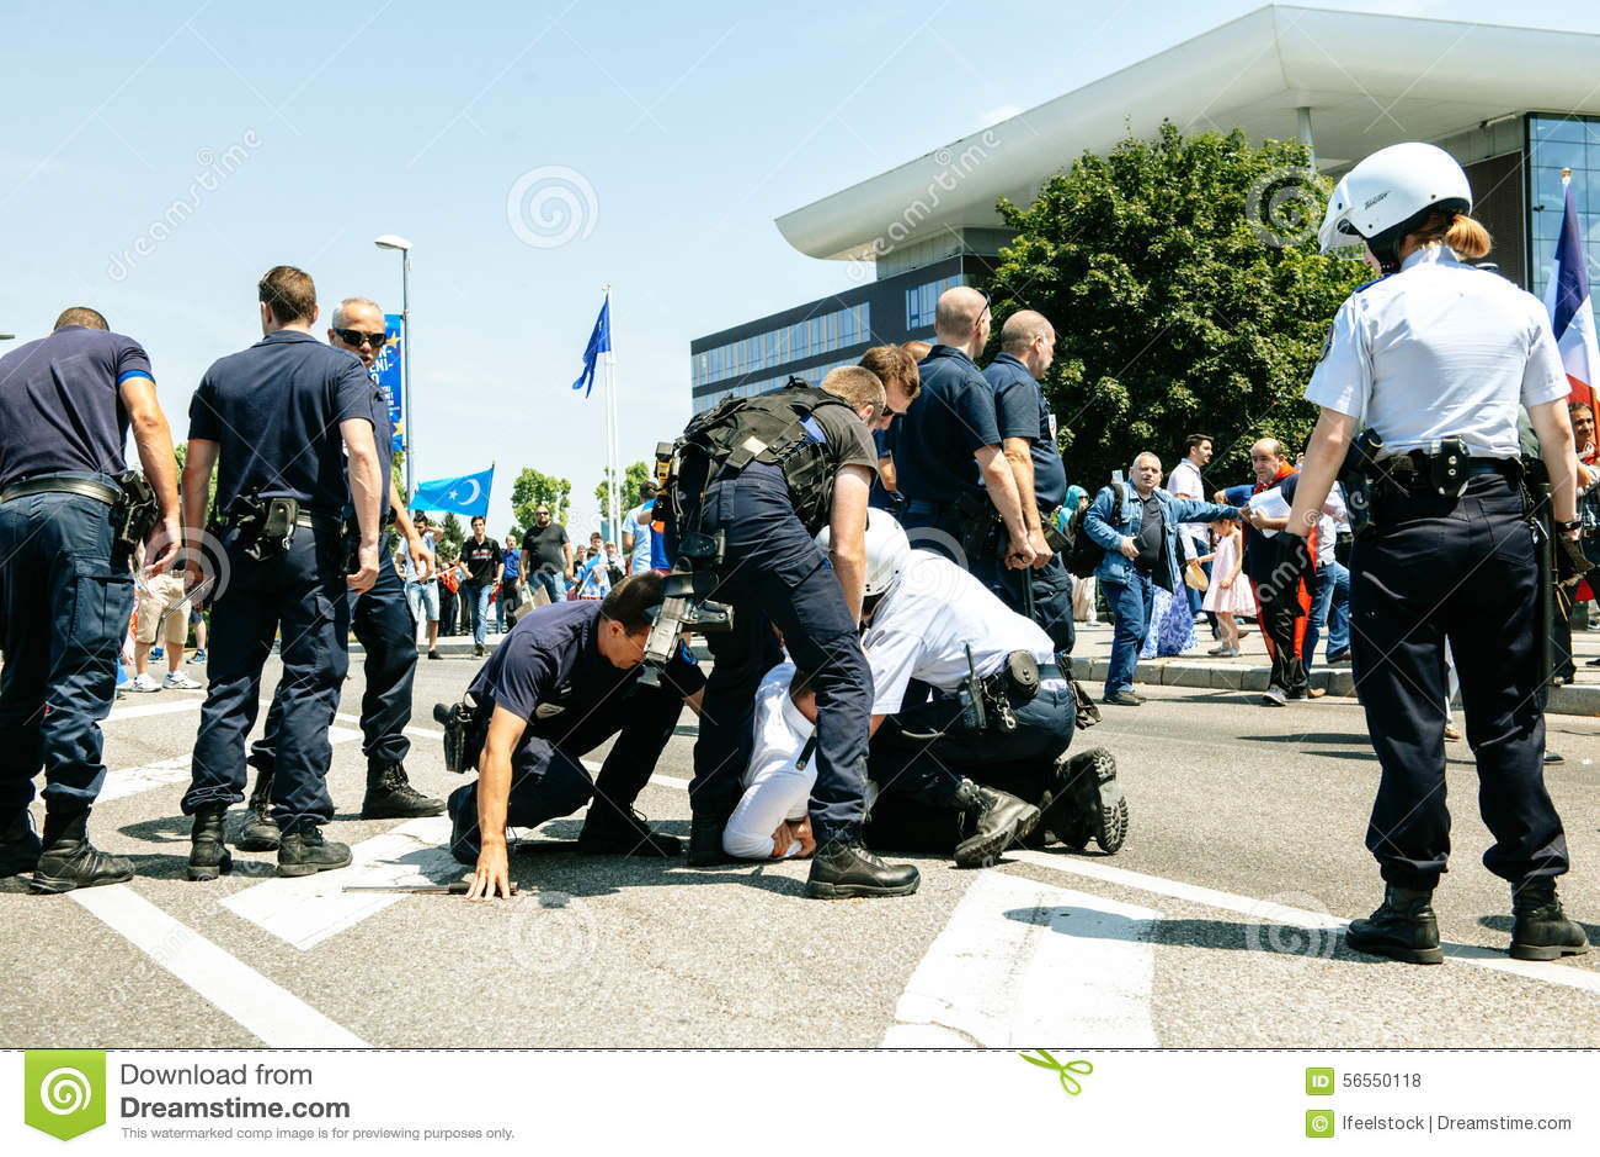 Download Διαμαρτυρία ενεργών στελεχών των ανθρώπινων δικαιωμάτων Uyghur Εκδοτική Στοκ Εικόνες - εικόνα από ταραχή, μορφή: 56550118